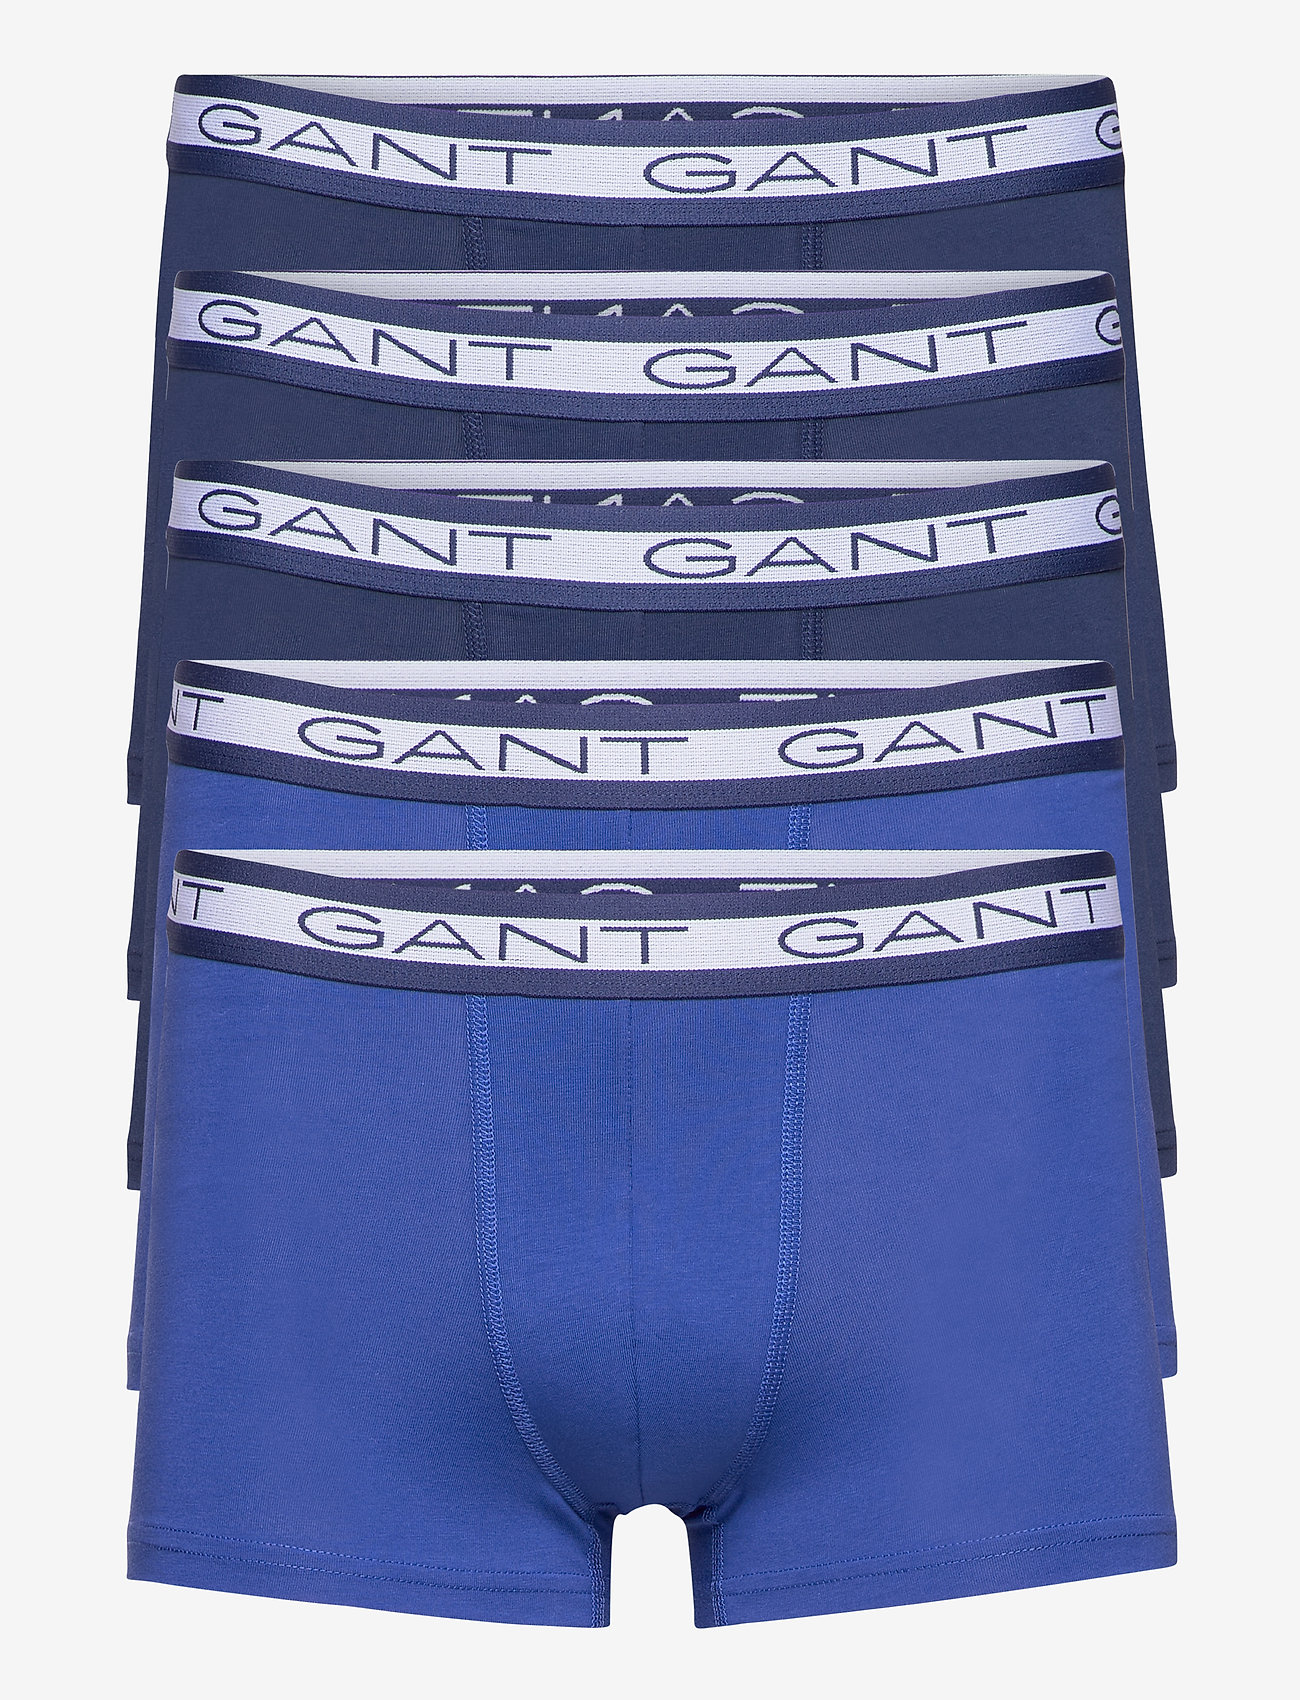 GANT - BASIC TRUNK 5-PACK - boxers - persian blue - 0